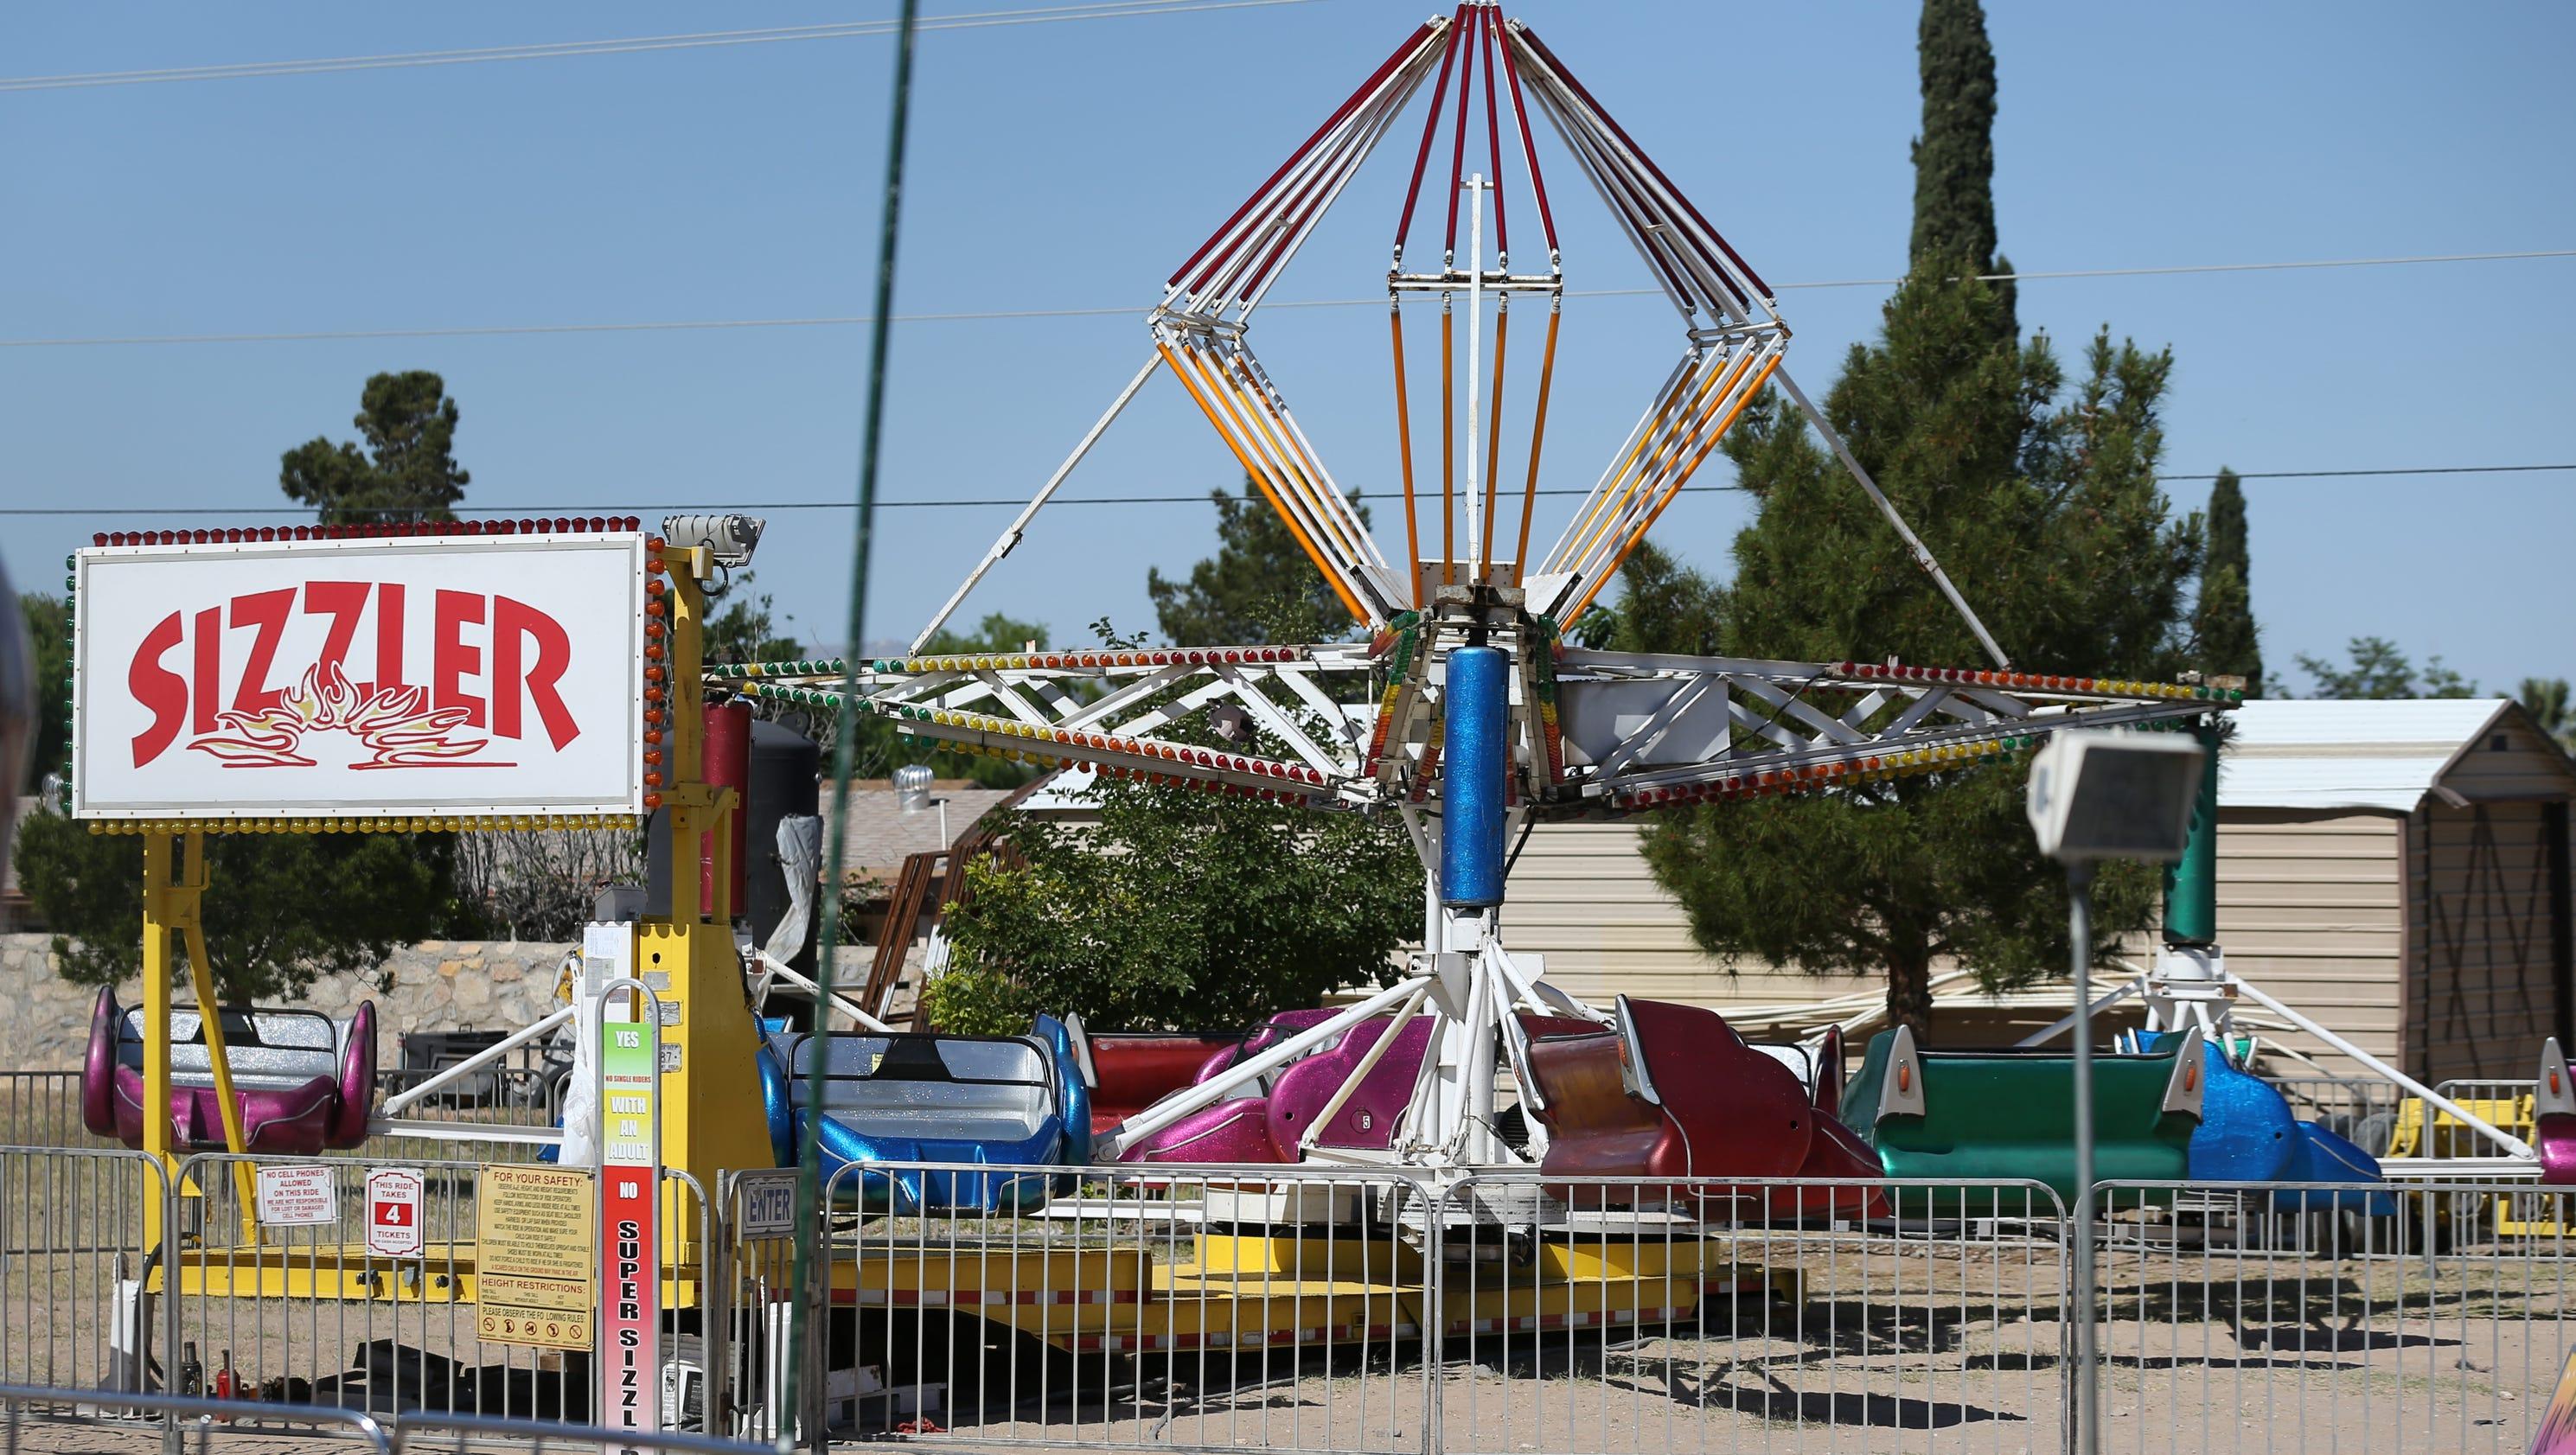 Vintage carnival ride www imgarcade com online image arcade - Filename 635976396858533439 Carnival Accident 1 Jpg